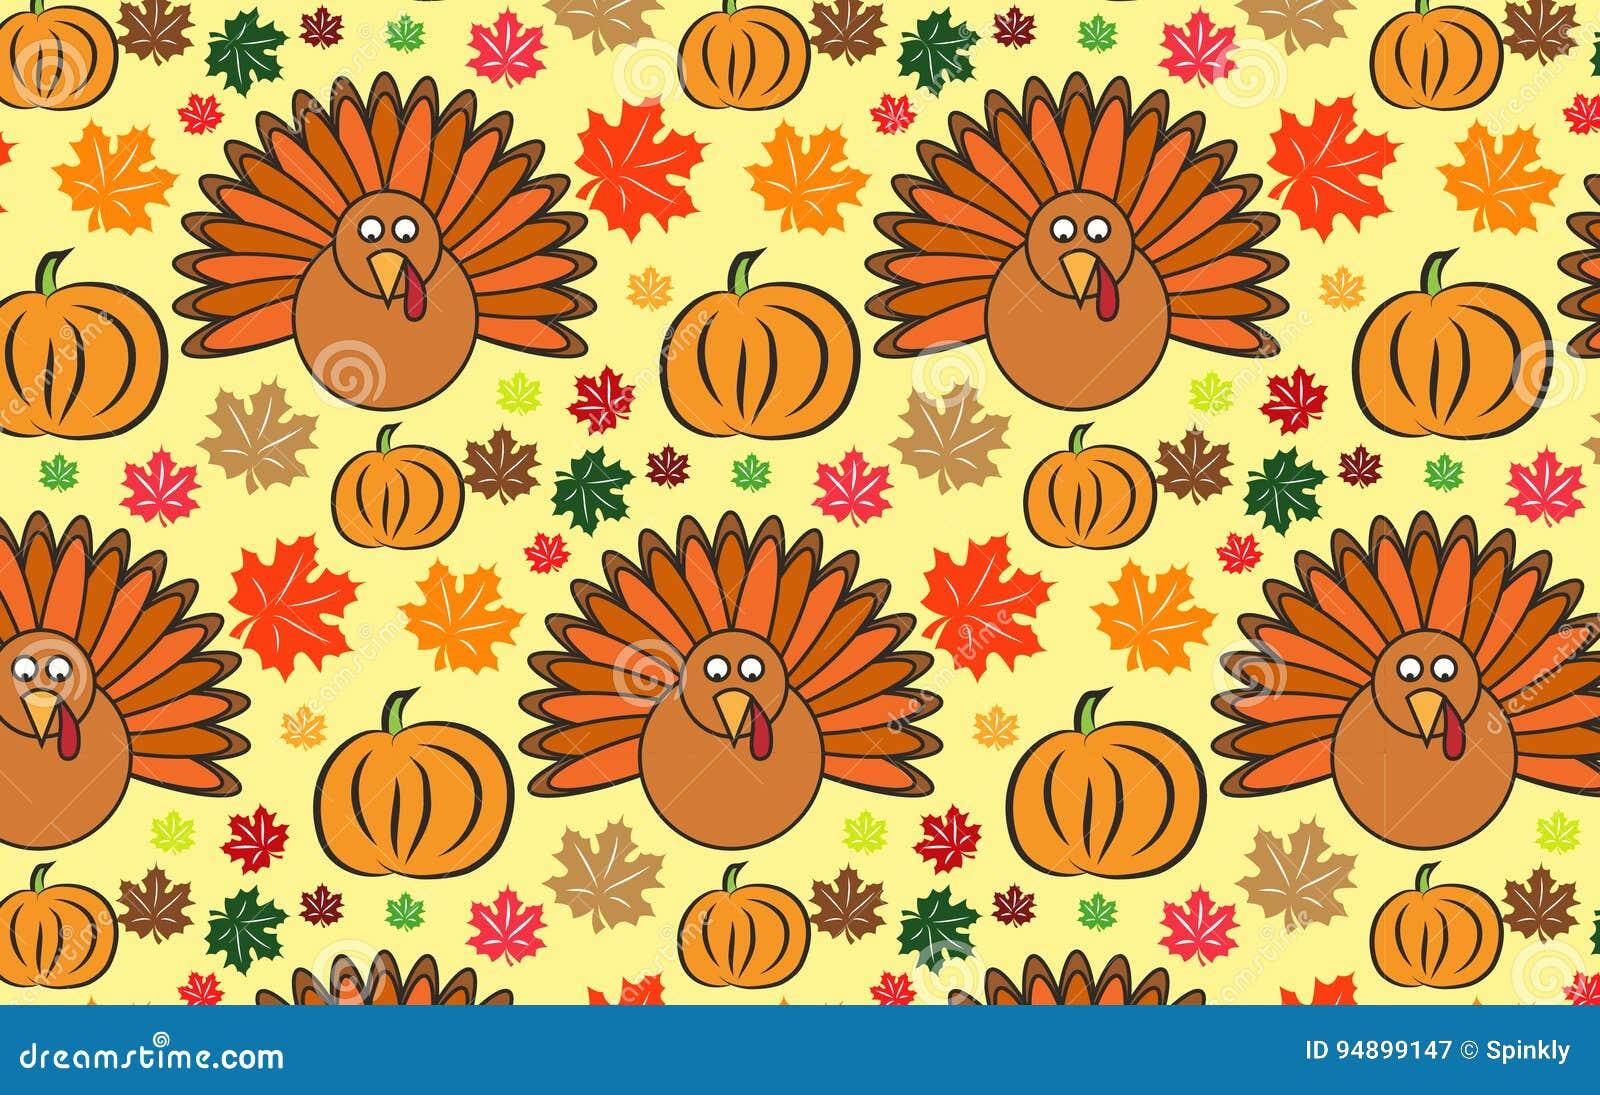 Thanksgiving Wallpaper Stock Image Illustration Of Clipart